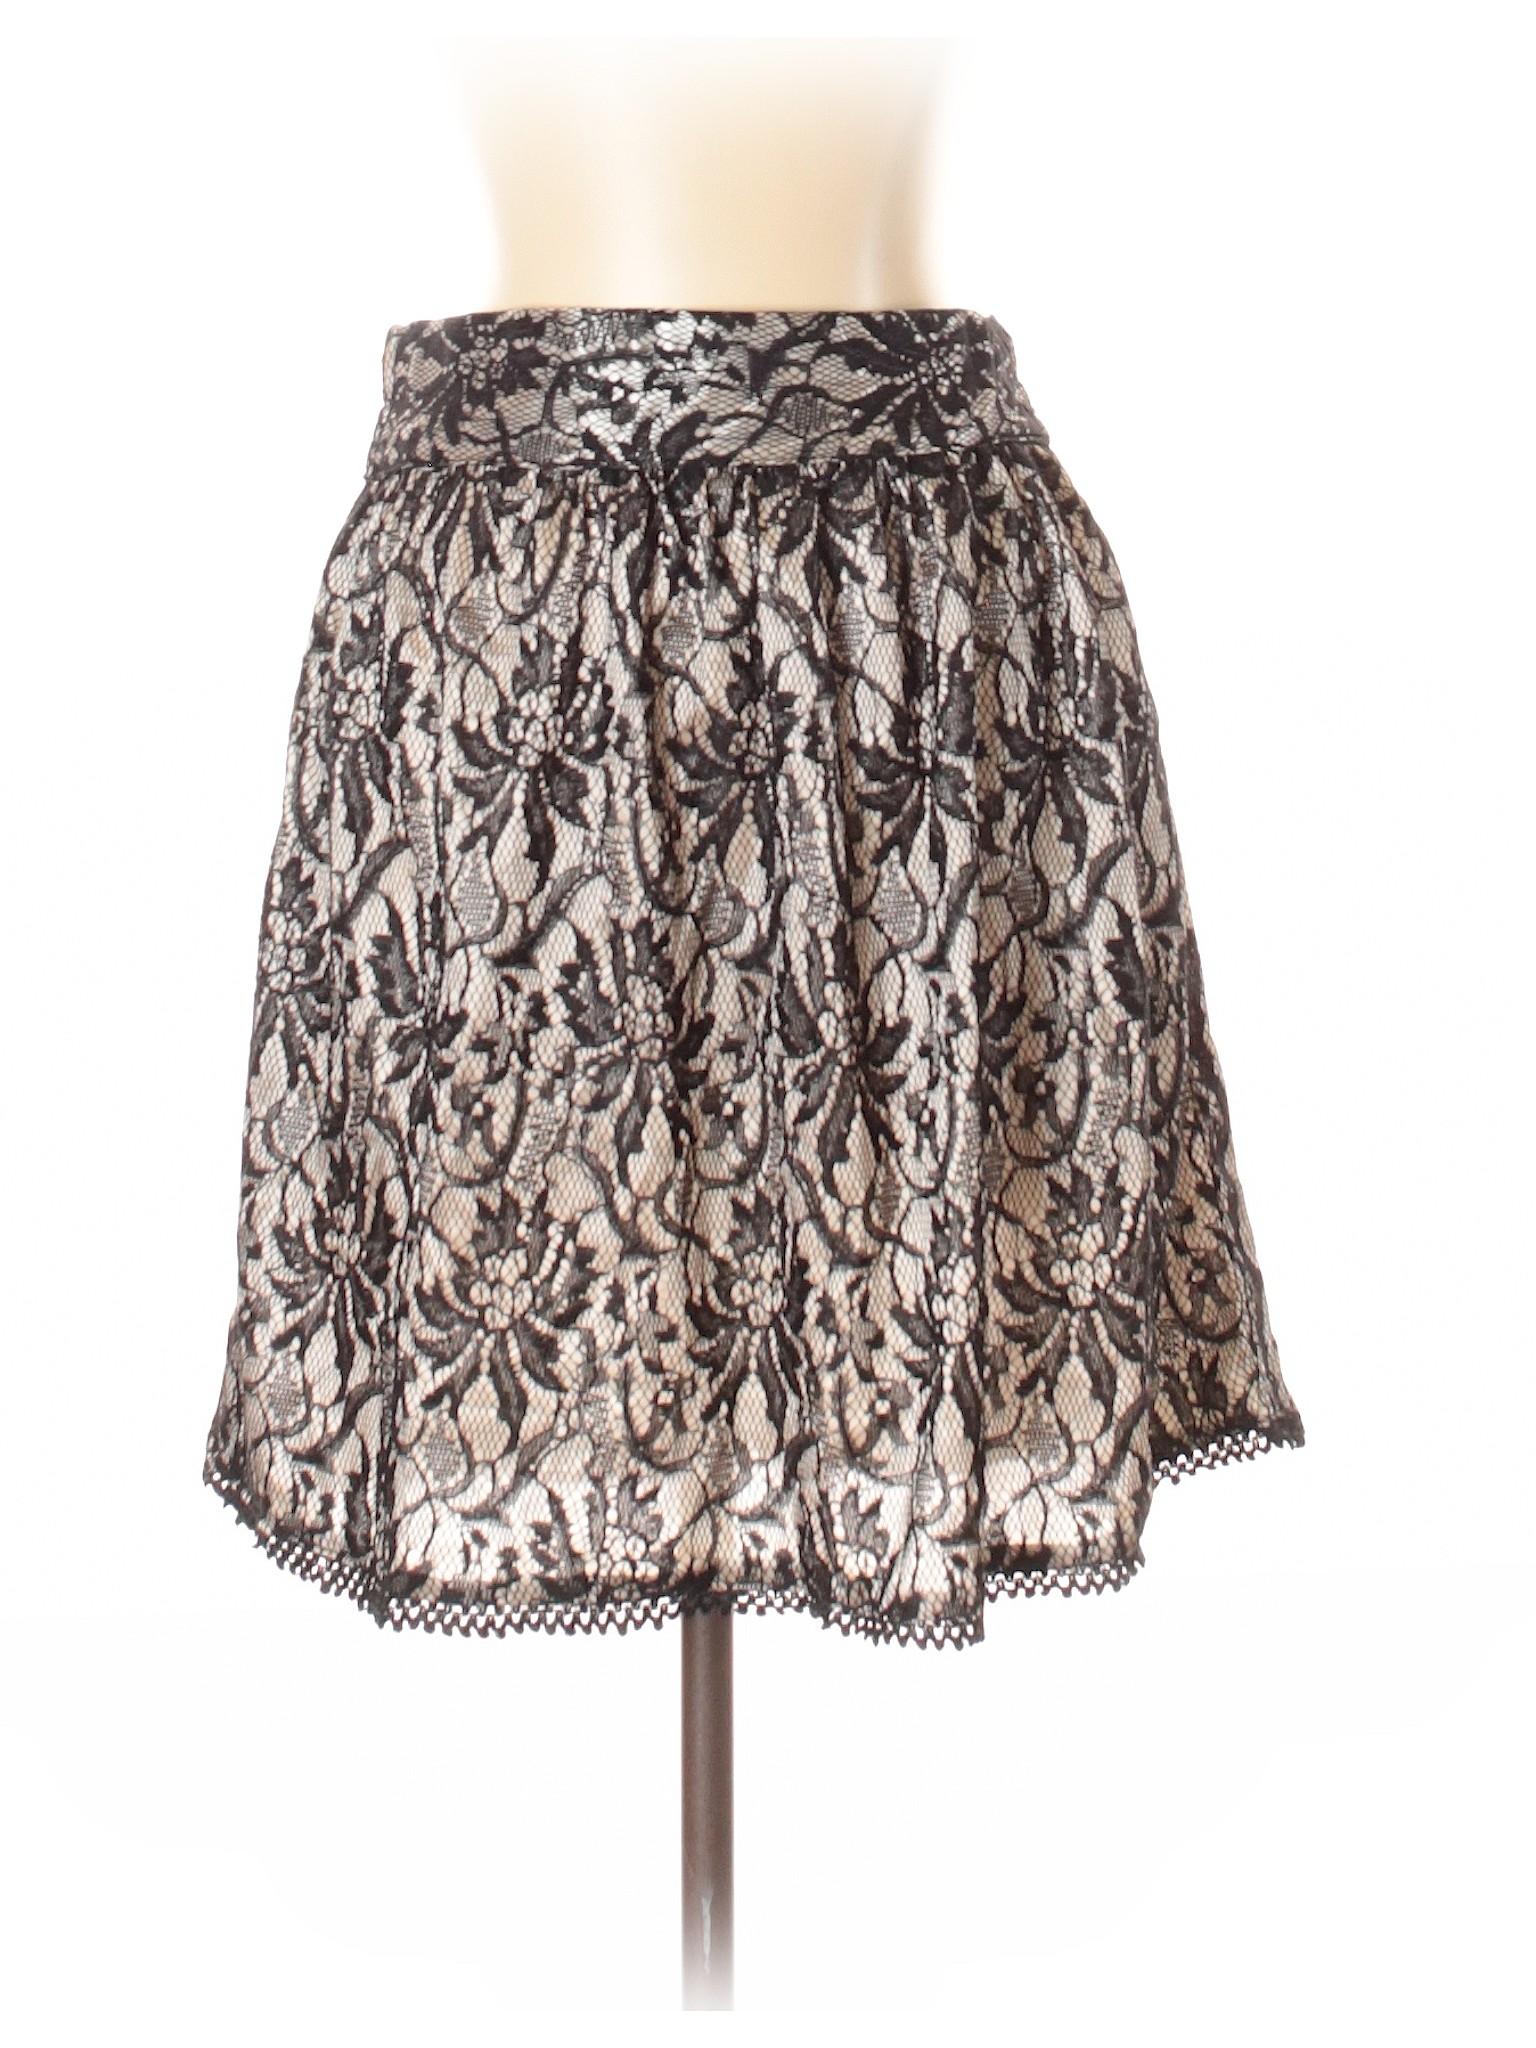 Casual Boutique Skirt Boutique Casual Boutique Skirt Casual XfCXq